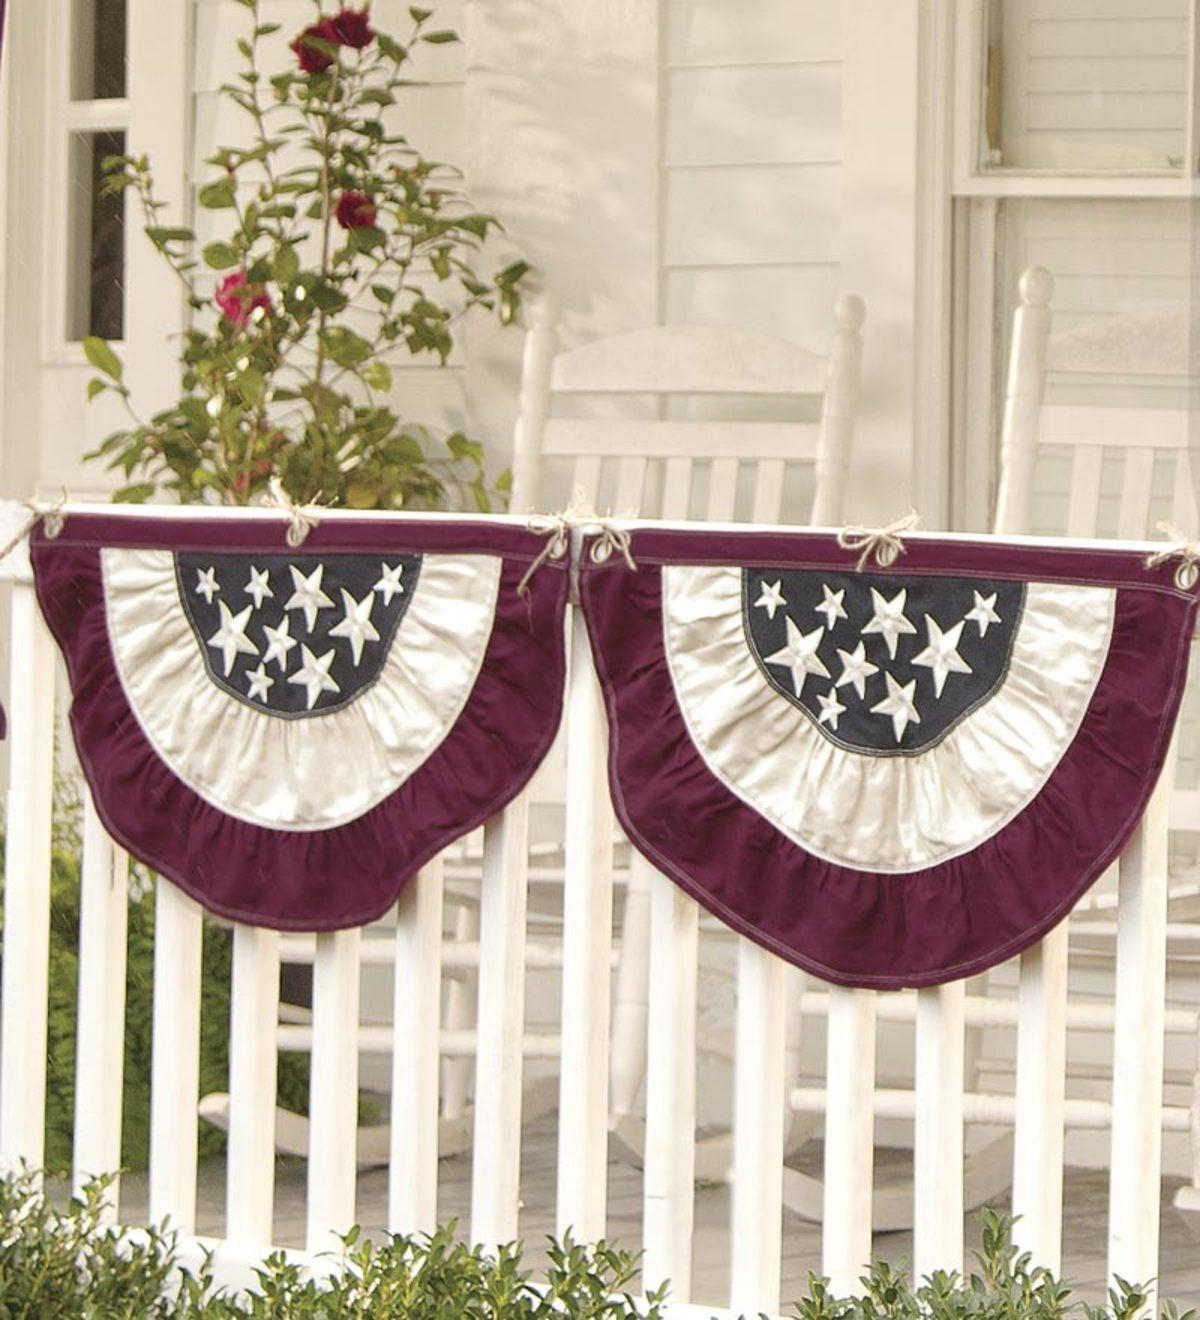 Large Half Round Americana Flag Bunting 60 1 2 Quot W X 31 1 4